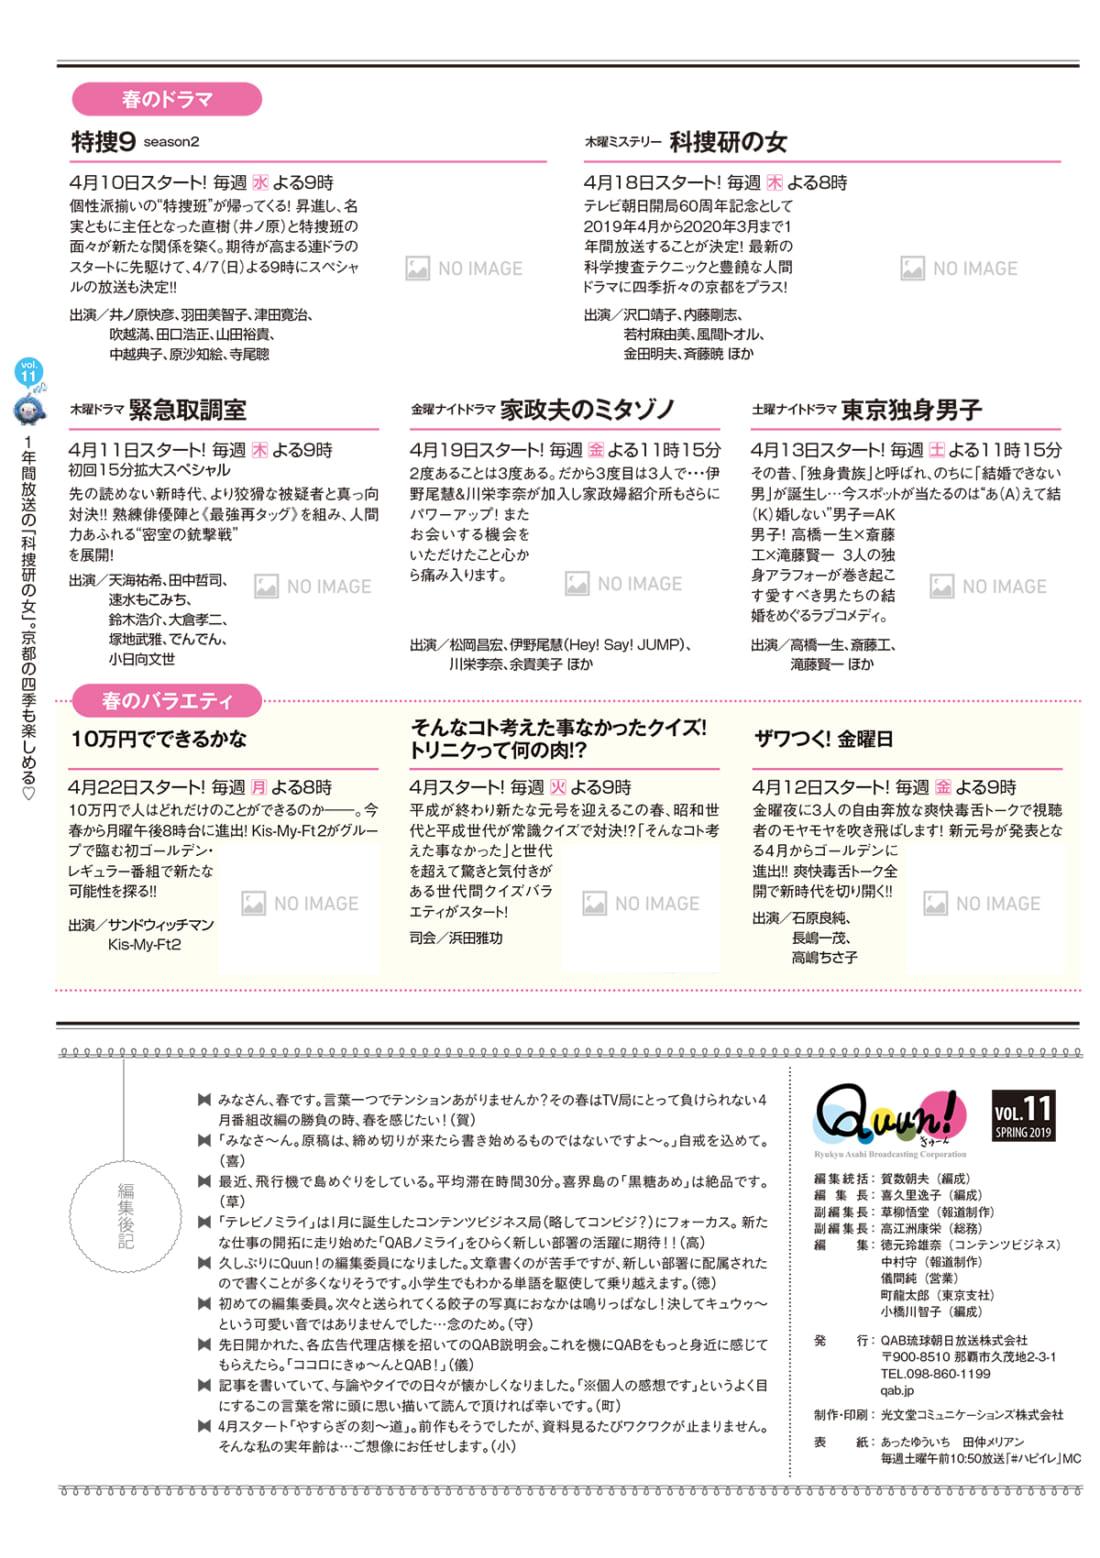 https://www.qab.co.jp/qgoro/wp-content/uploads/quun_1115-1100x1558.jpg